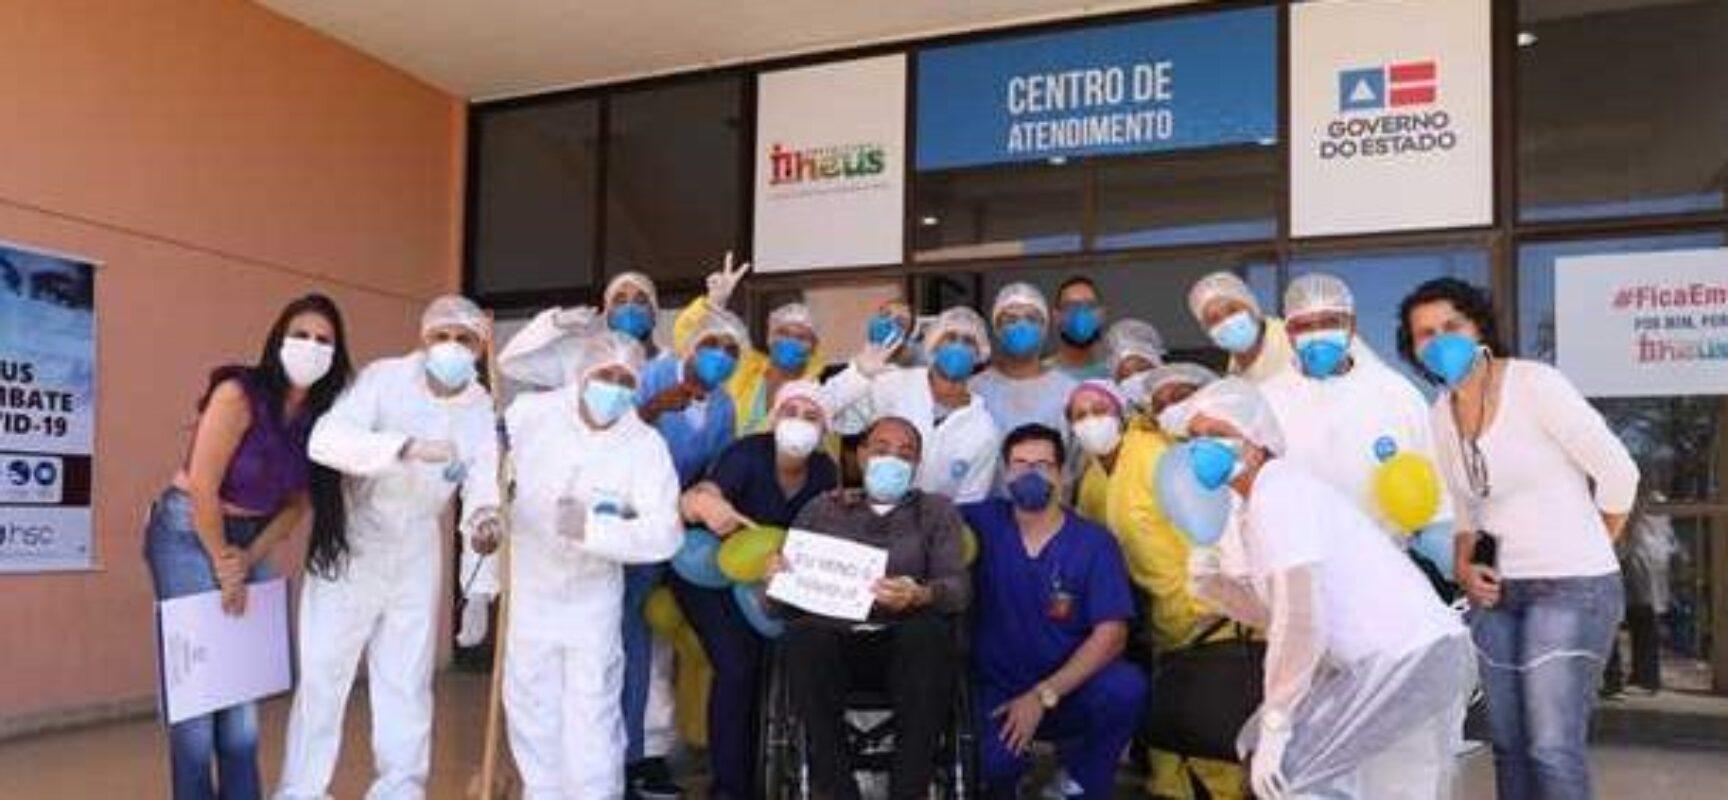 Centro Covid-19 de Ilhéus completa 1 ano de funcionamento e cobertura a 42 municípios